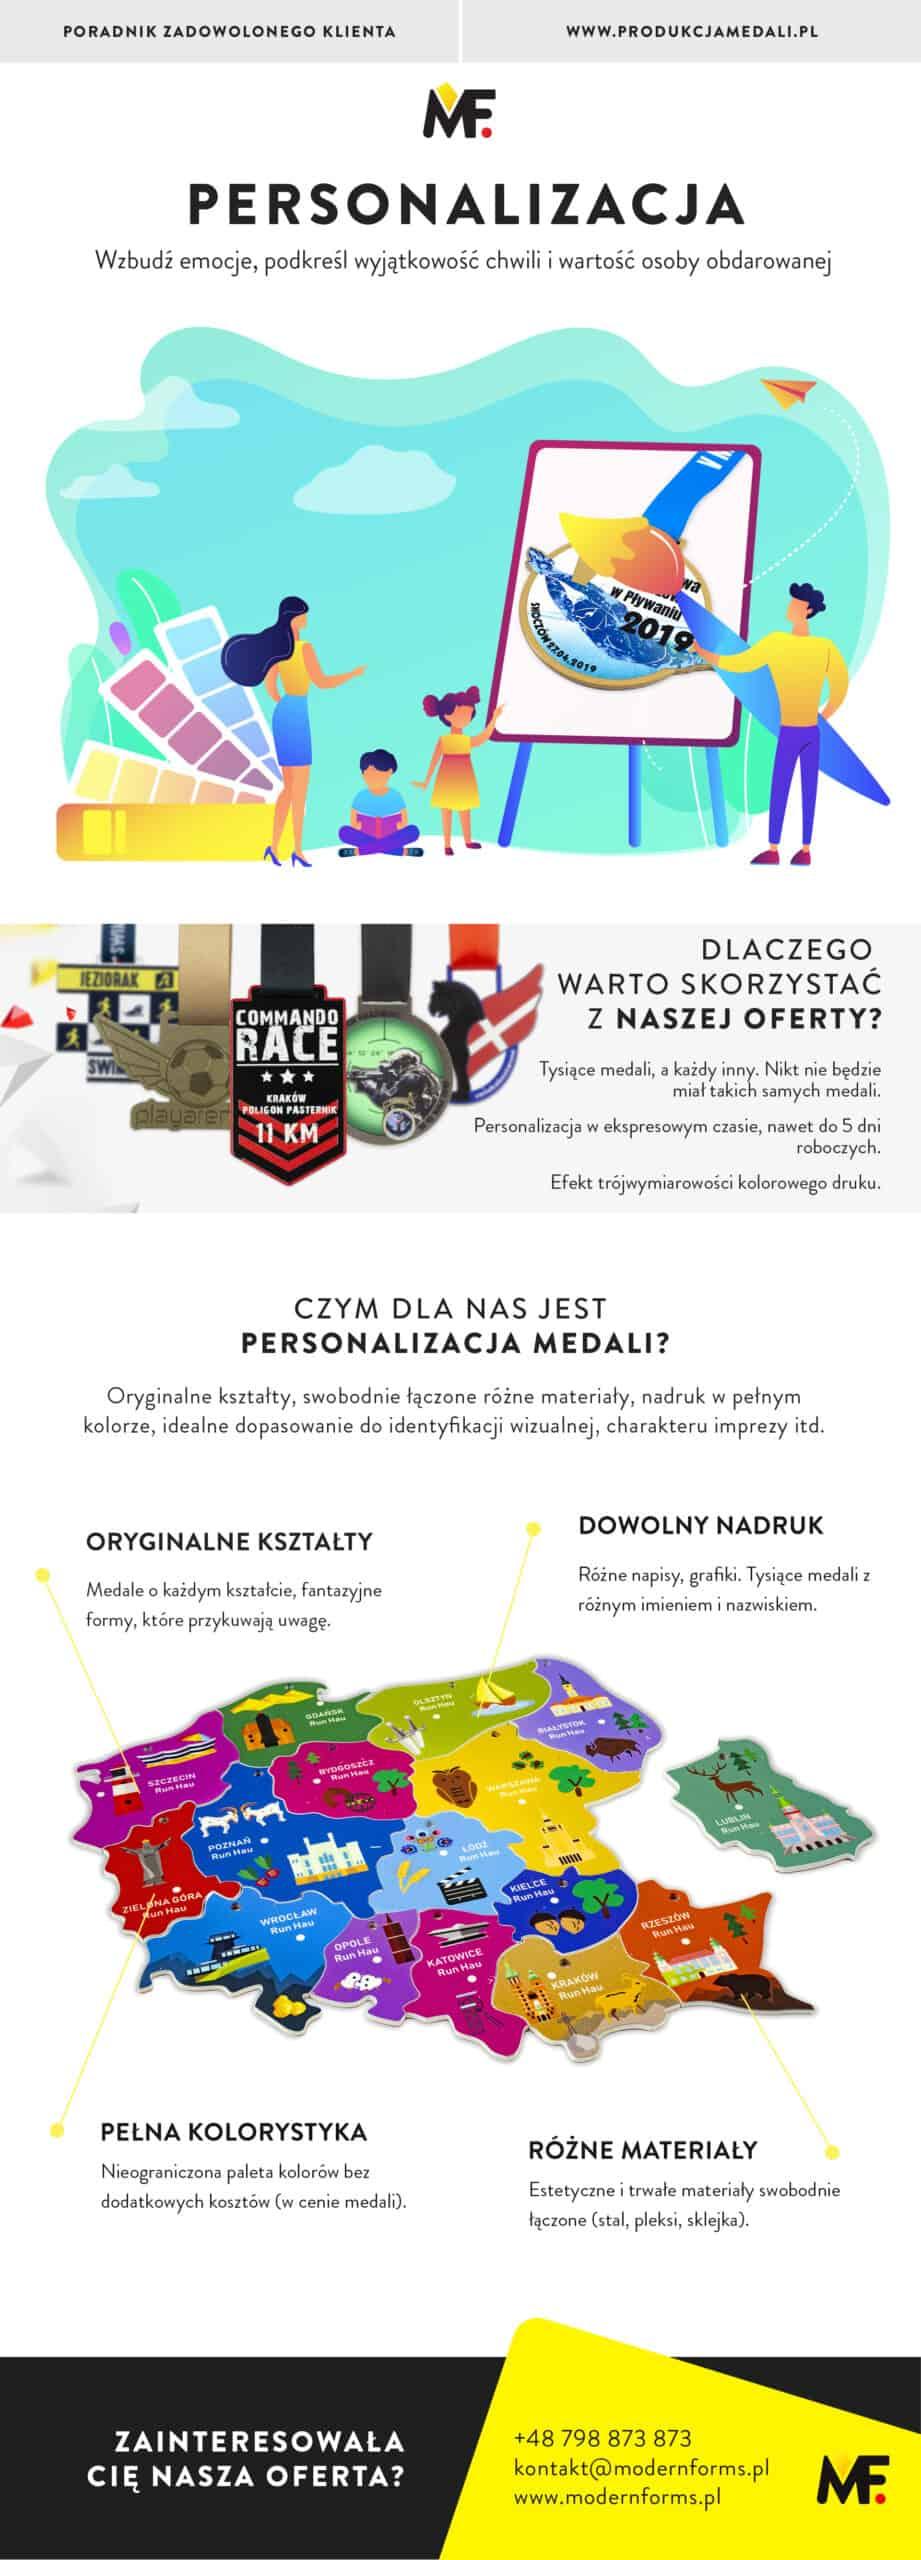 Personalizacja medali Modern Forms infografika